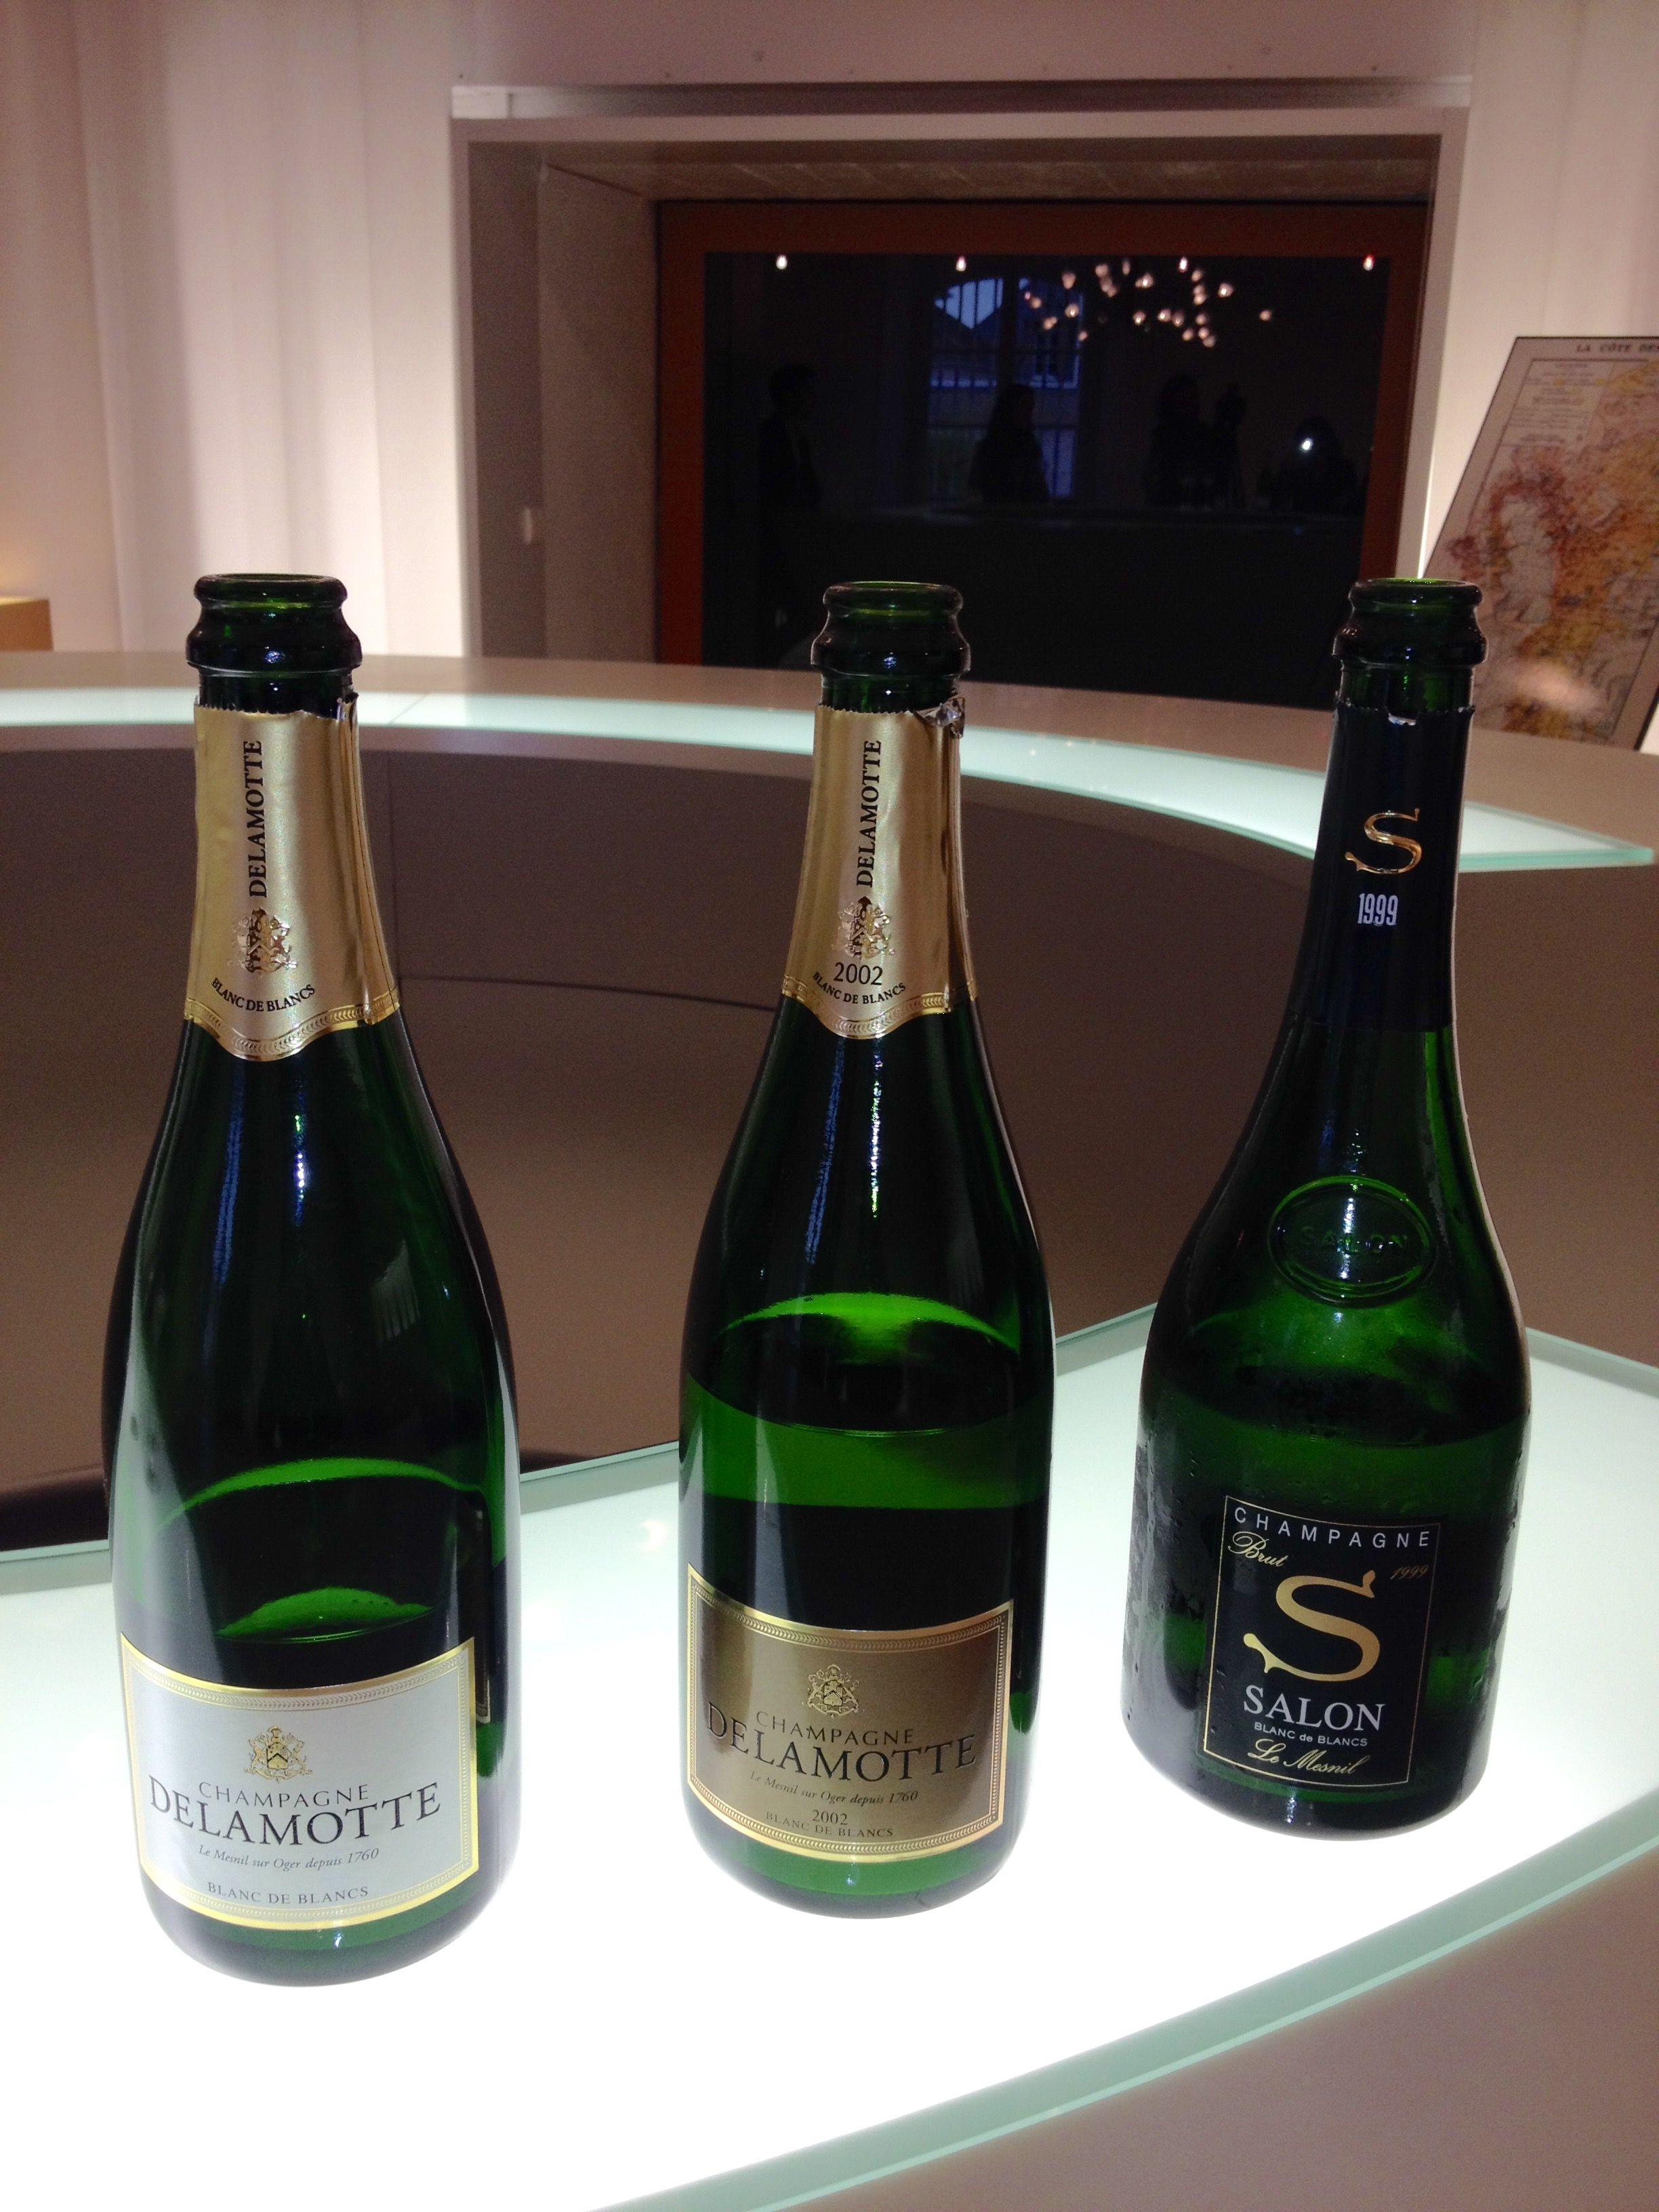 Champagne Delamotte Brut, Champagne Delamotte Blanc de blancs ...